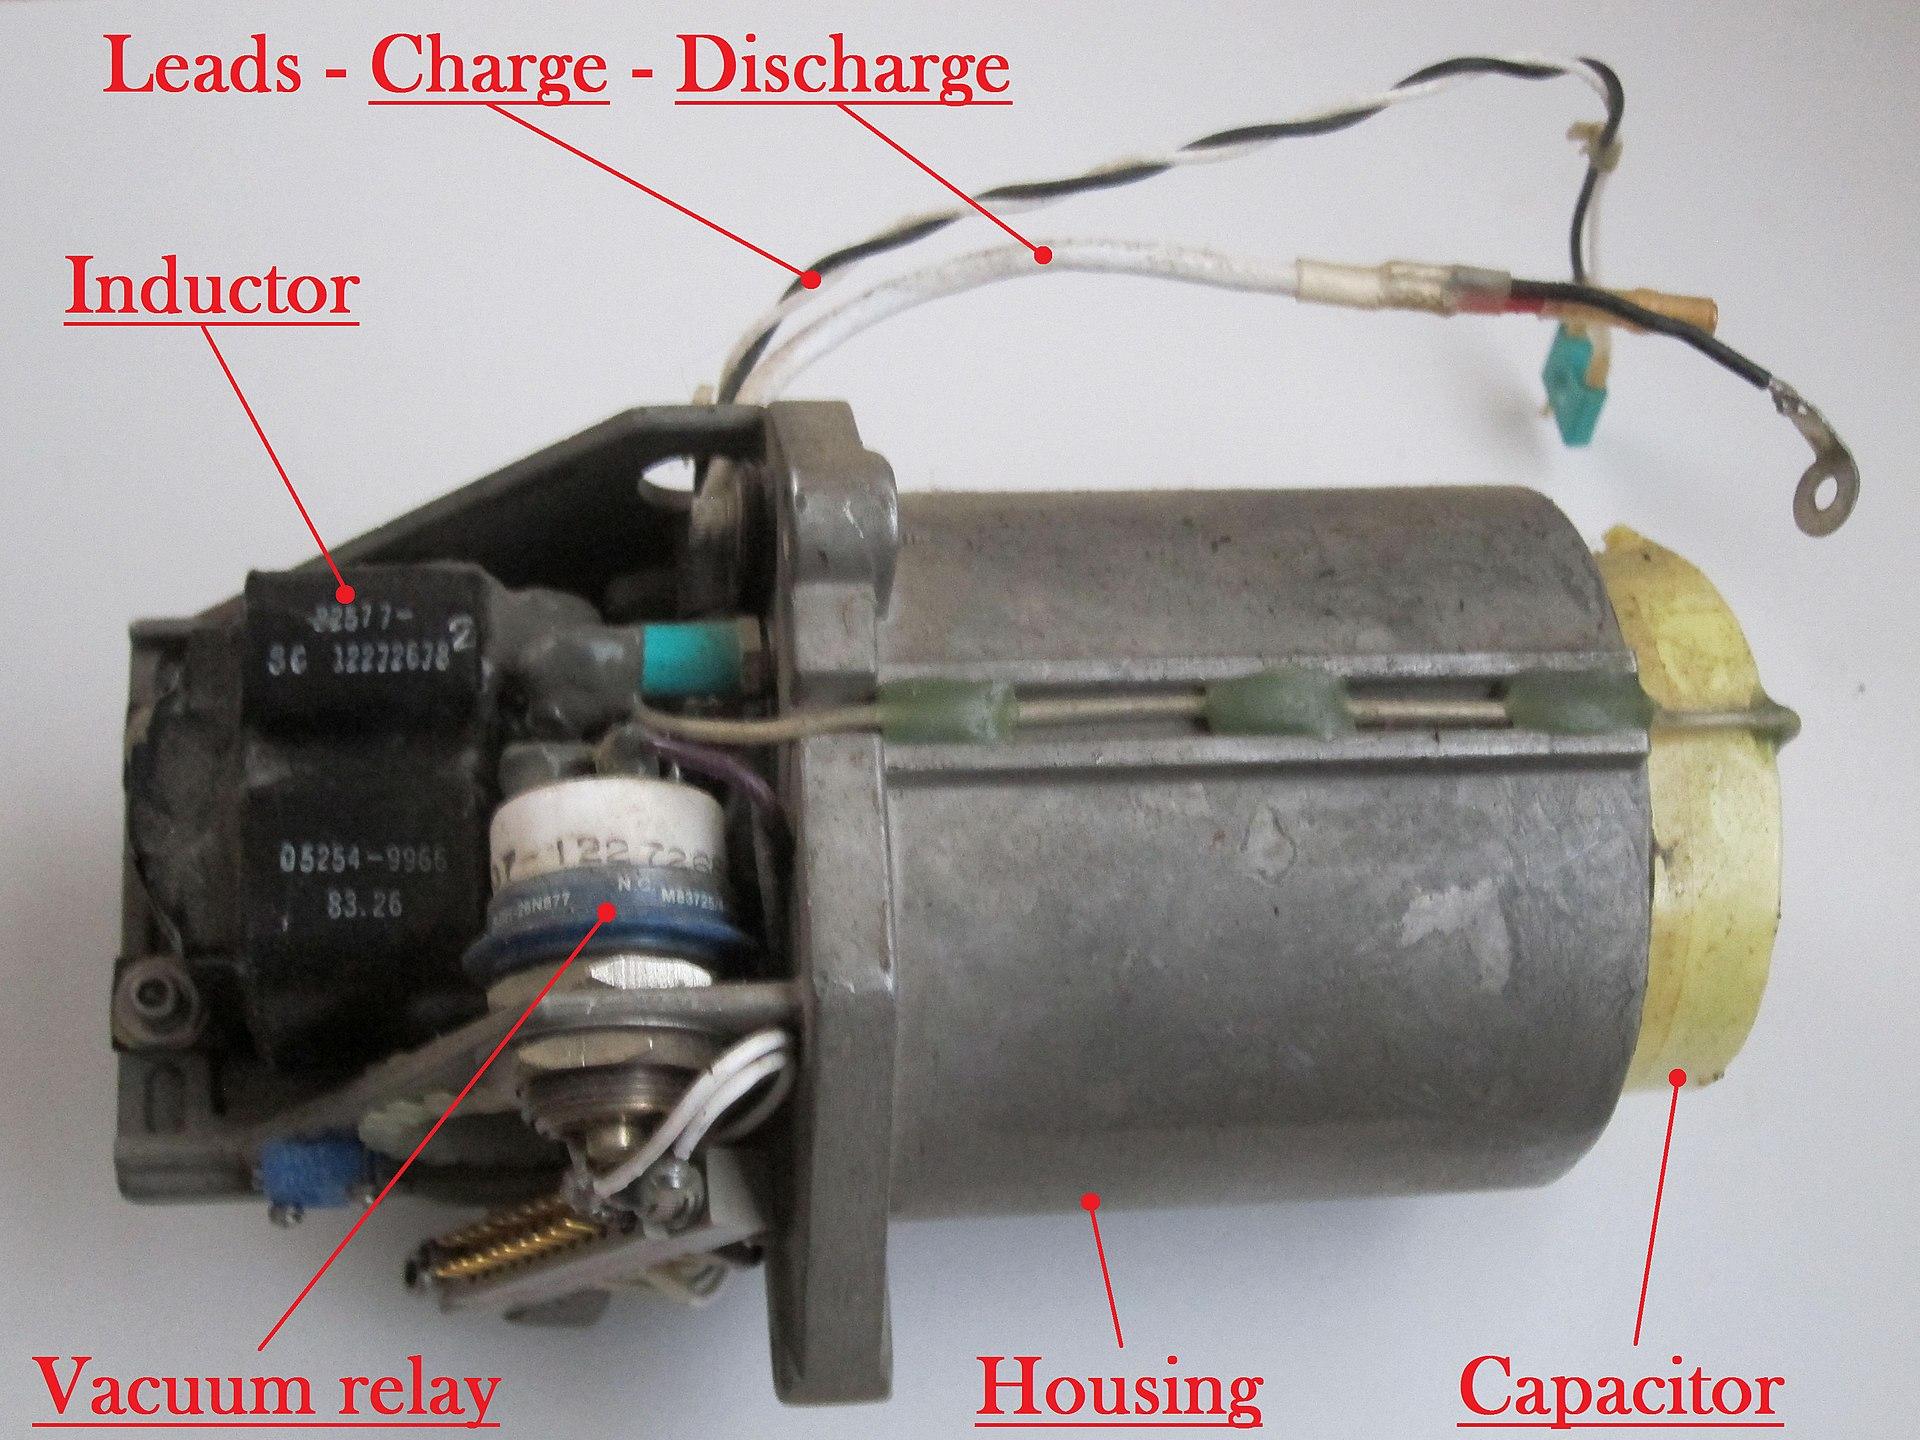 Electric Generator Circuit 8038 Function Automotivecircuit Diagram Pictures Of